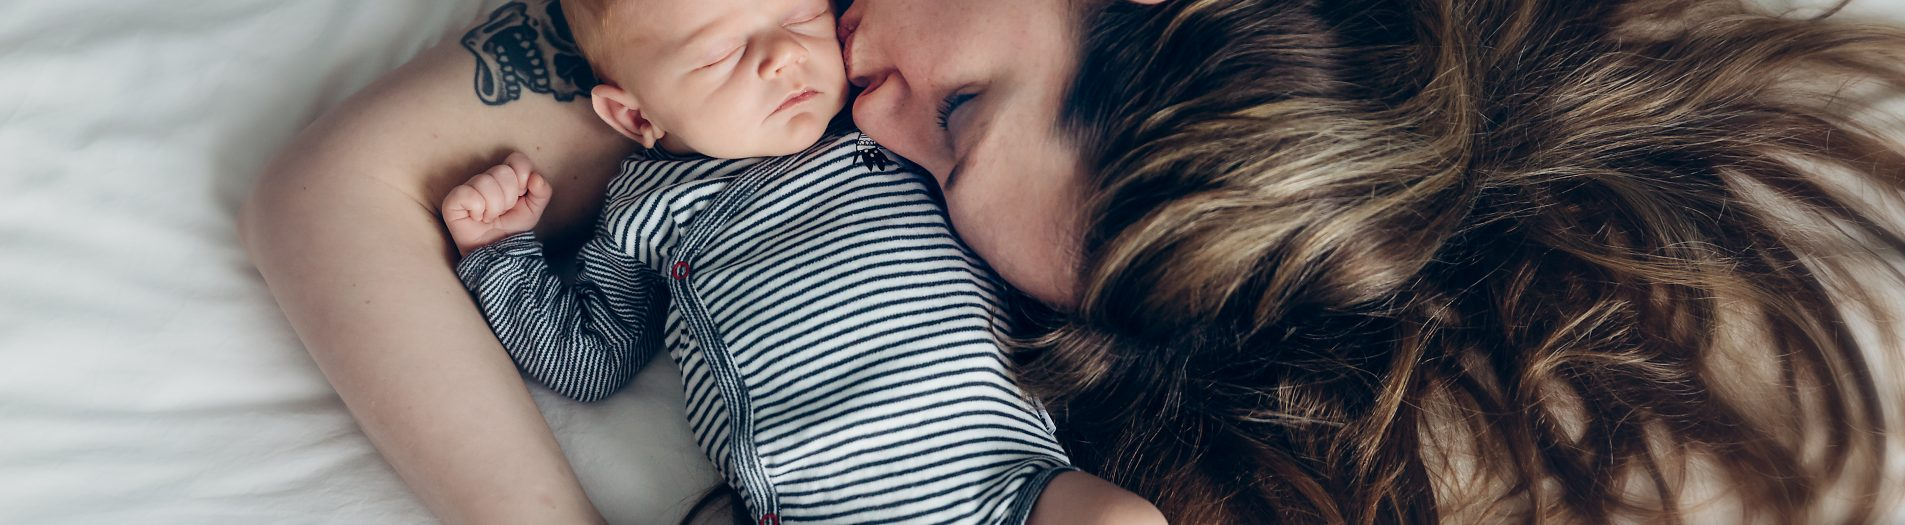 Newborn- en babyfotografie